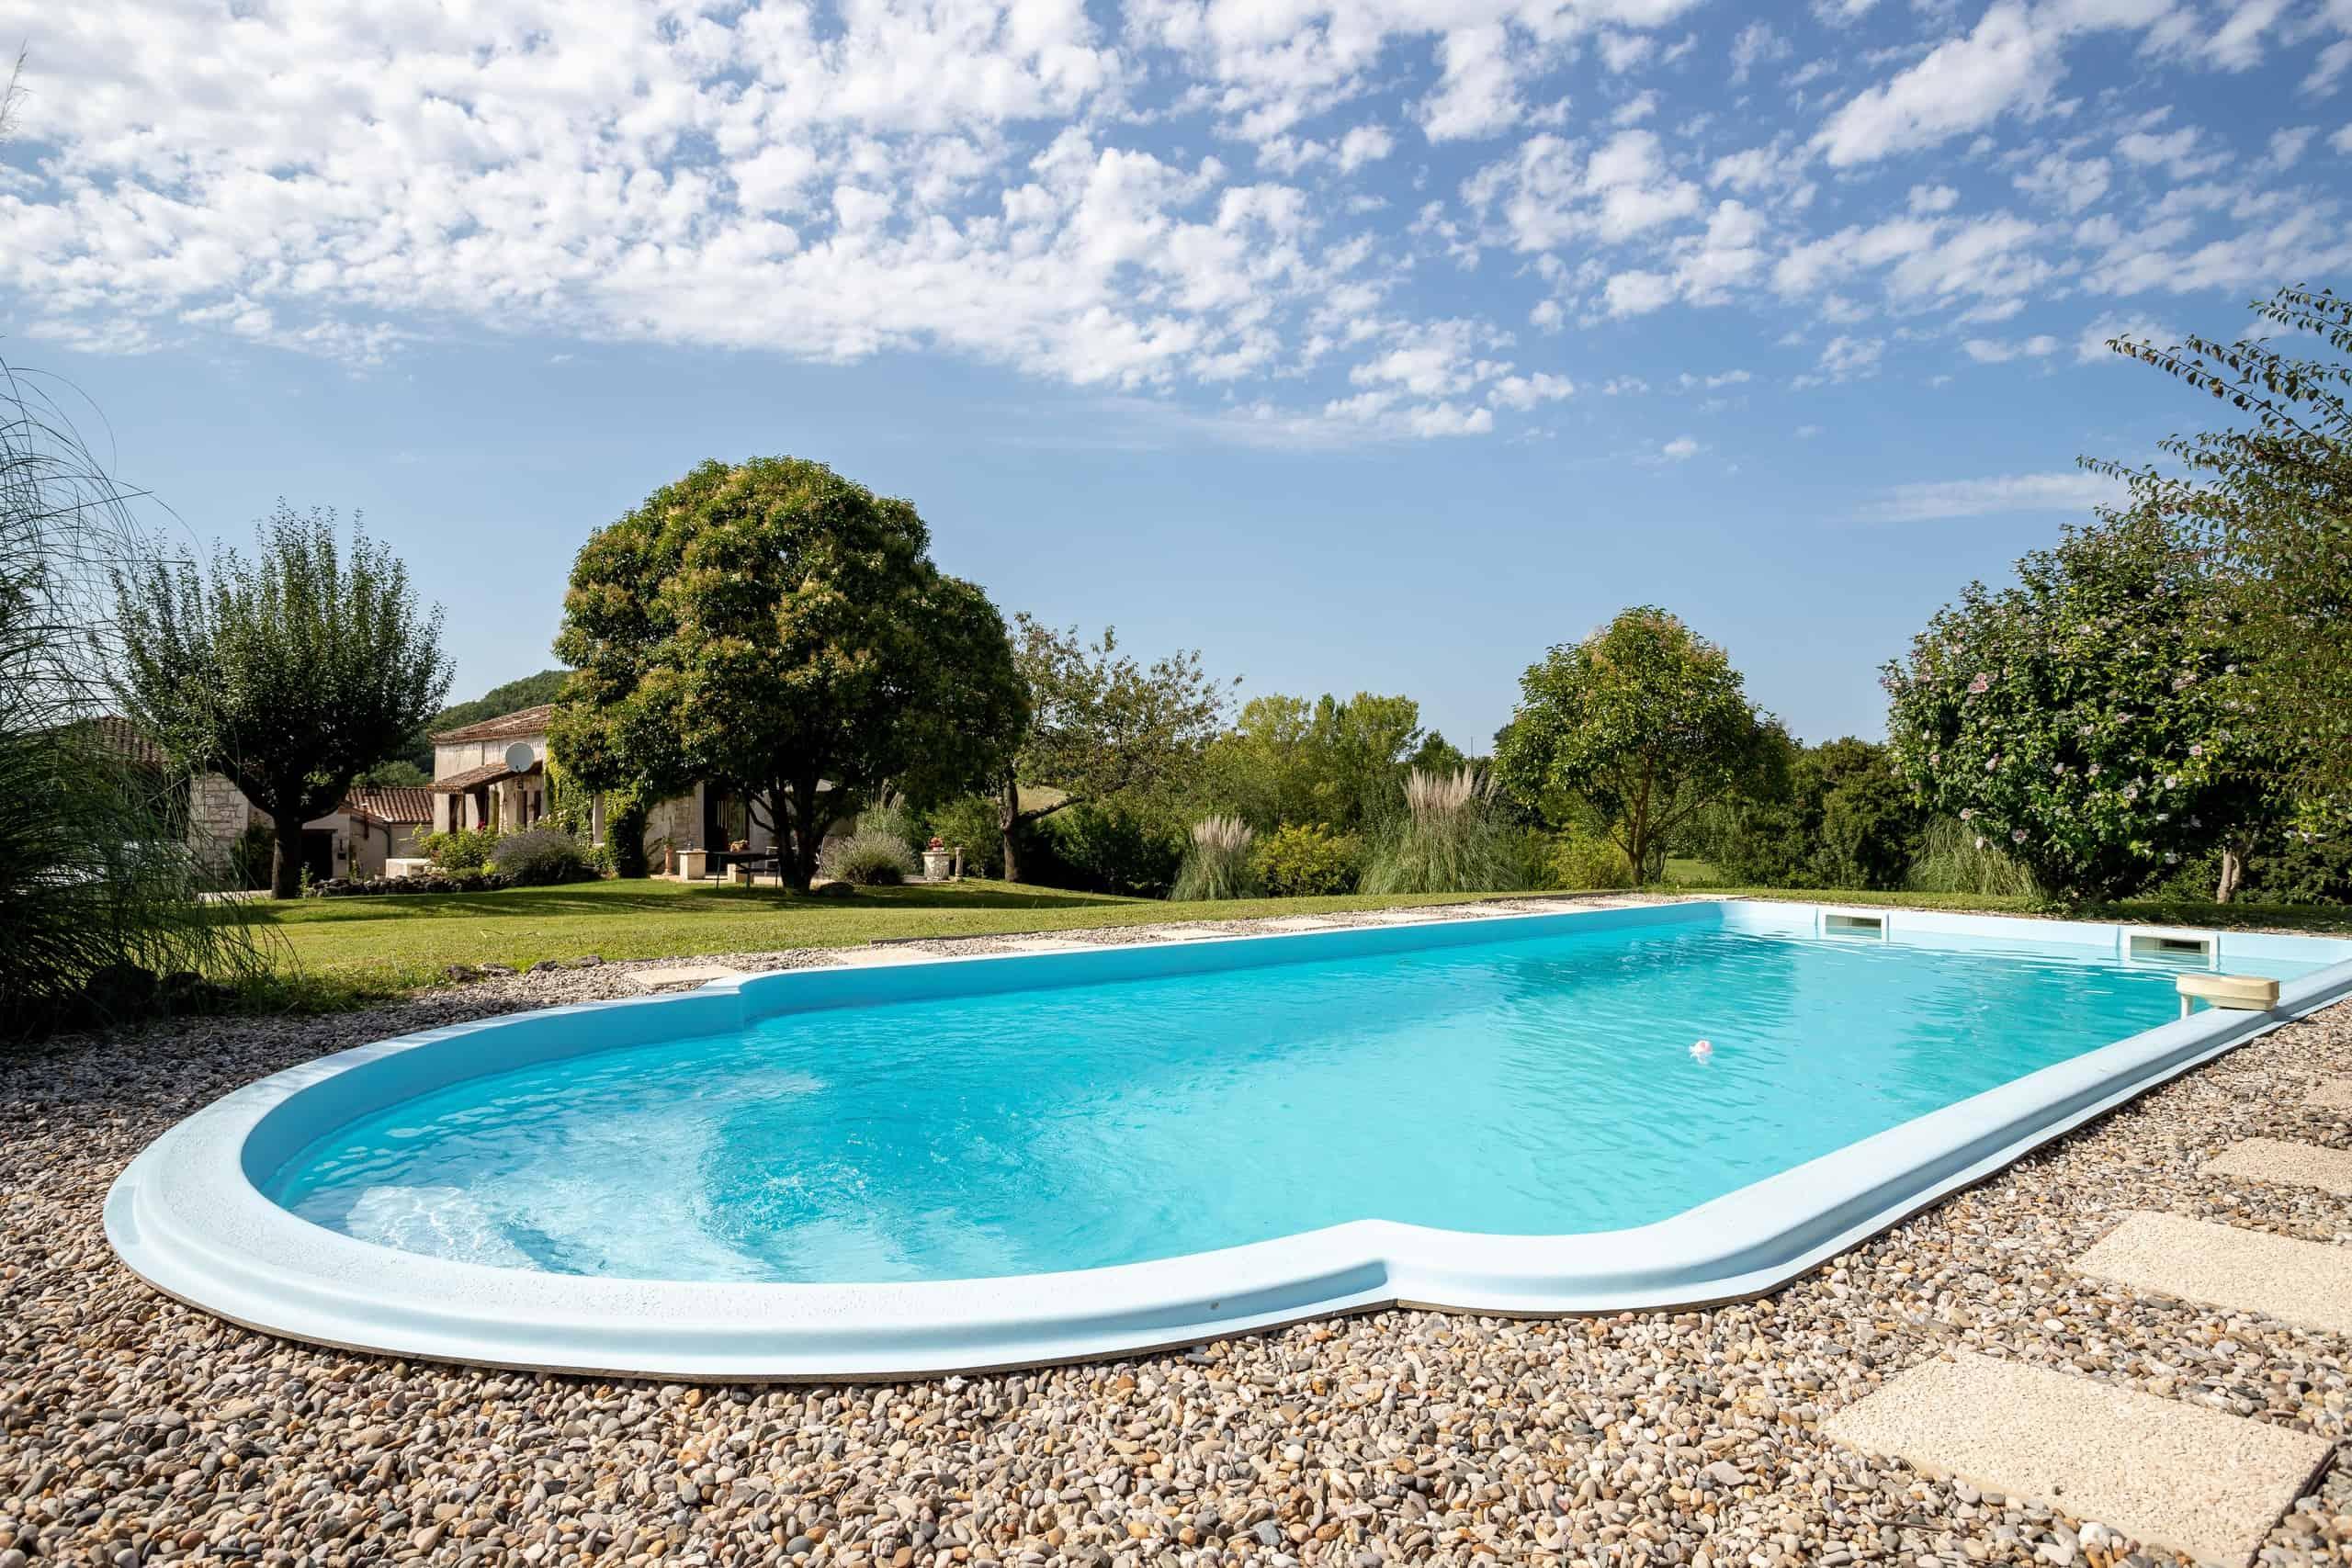 Fermeture de la piscine-WMC093